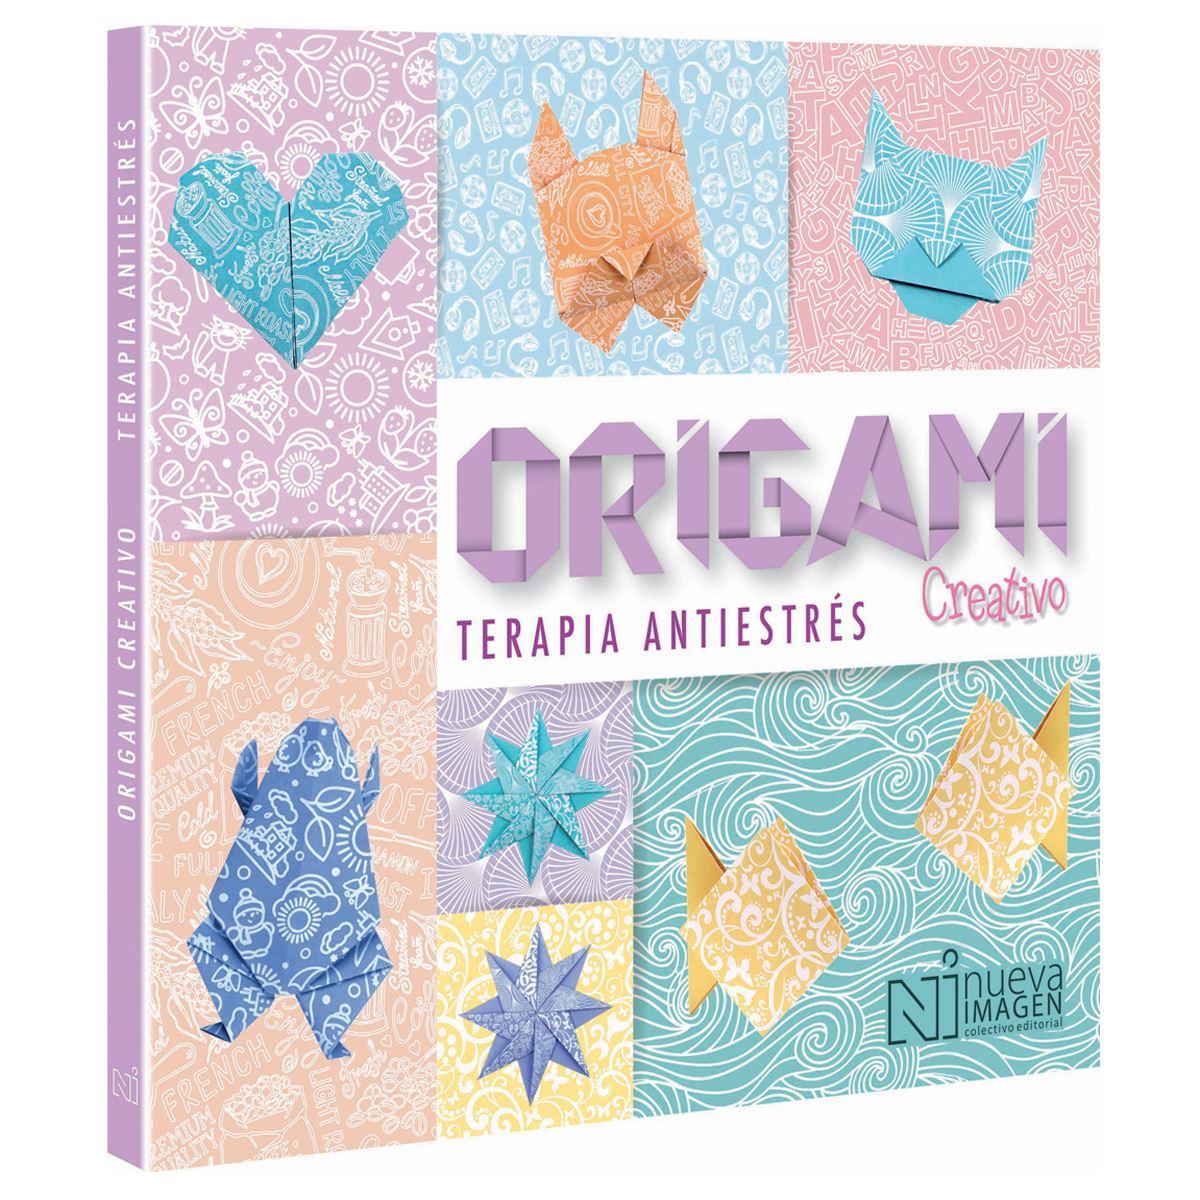 Origami creativo